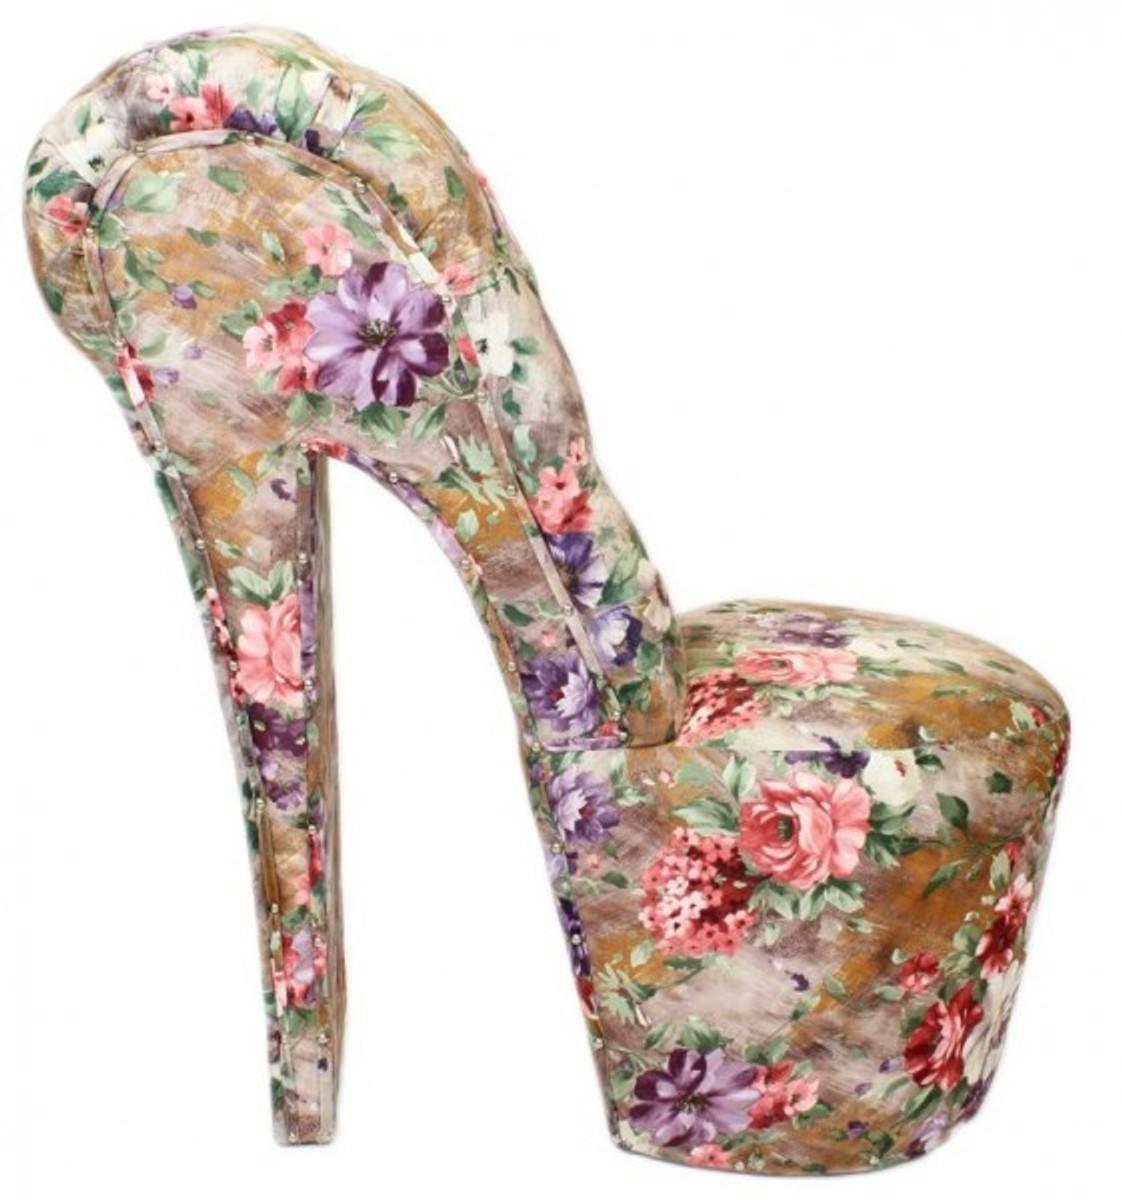 Casa Padrino High Heel Sessel Blaumen Muster Luxus Design - Designer Sessel - Club Möbel - Schuh Stuhl Sessel Blaumen Muster